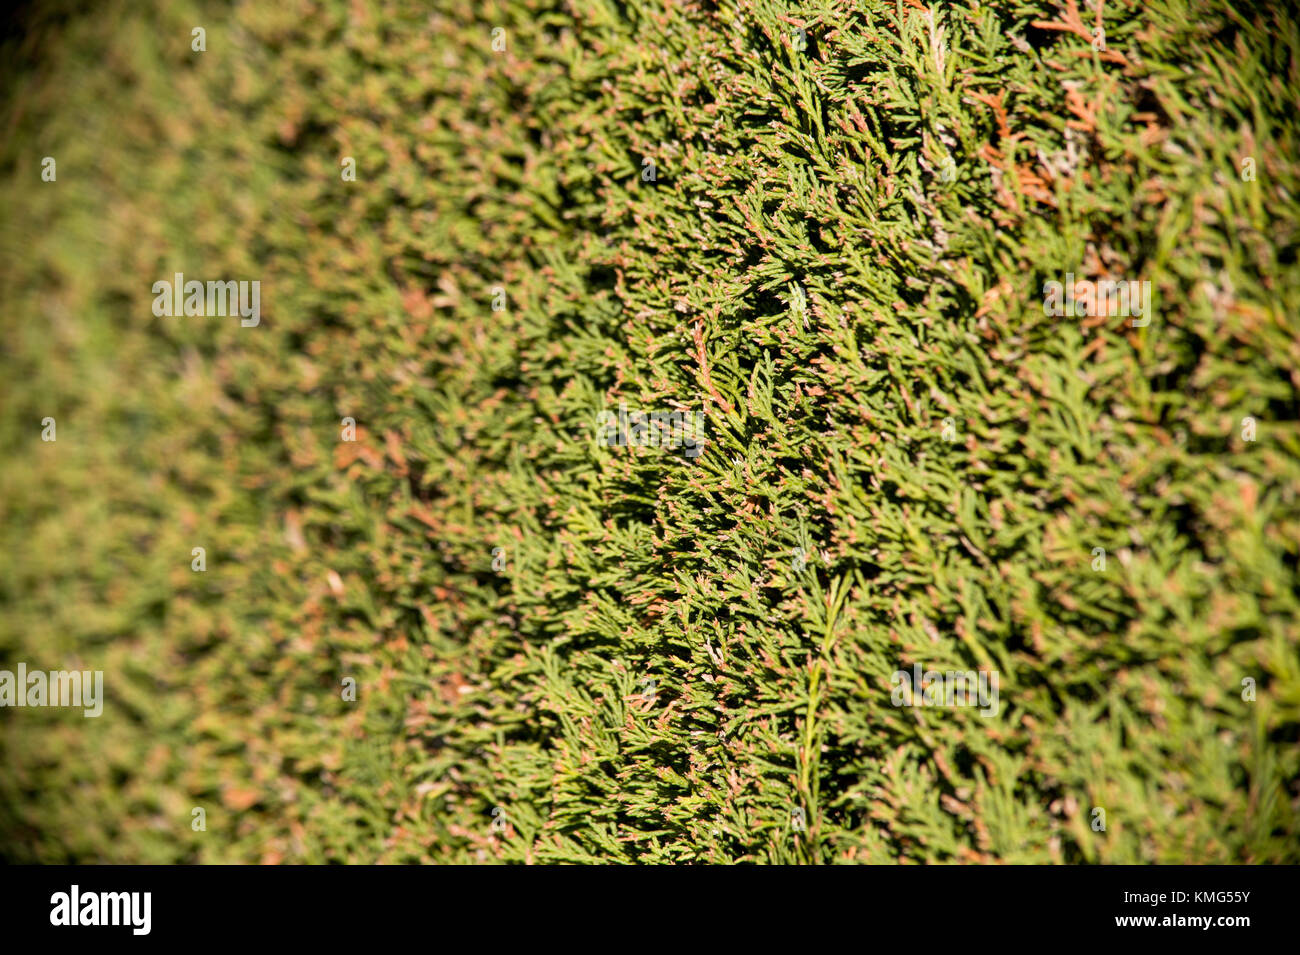 Yew Bush Stock Photos & Yew Bush Stock Images - Alamy